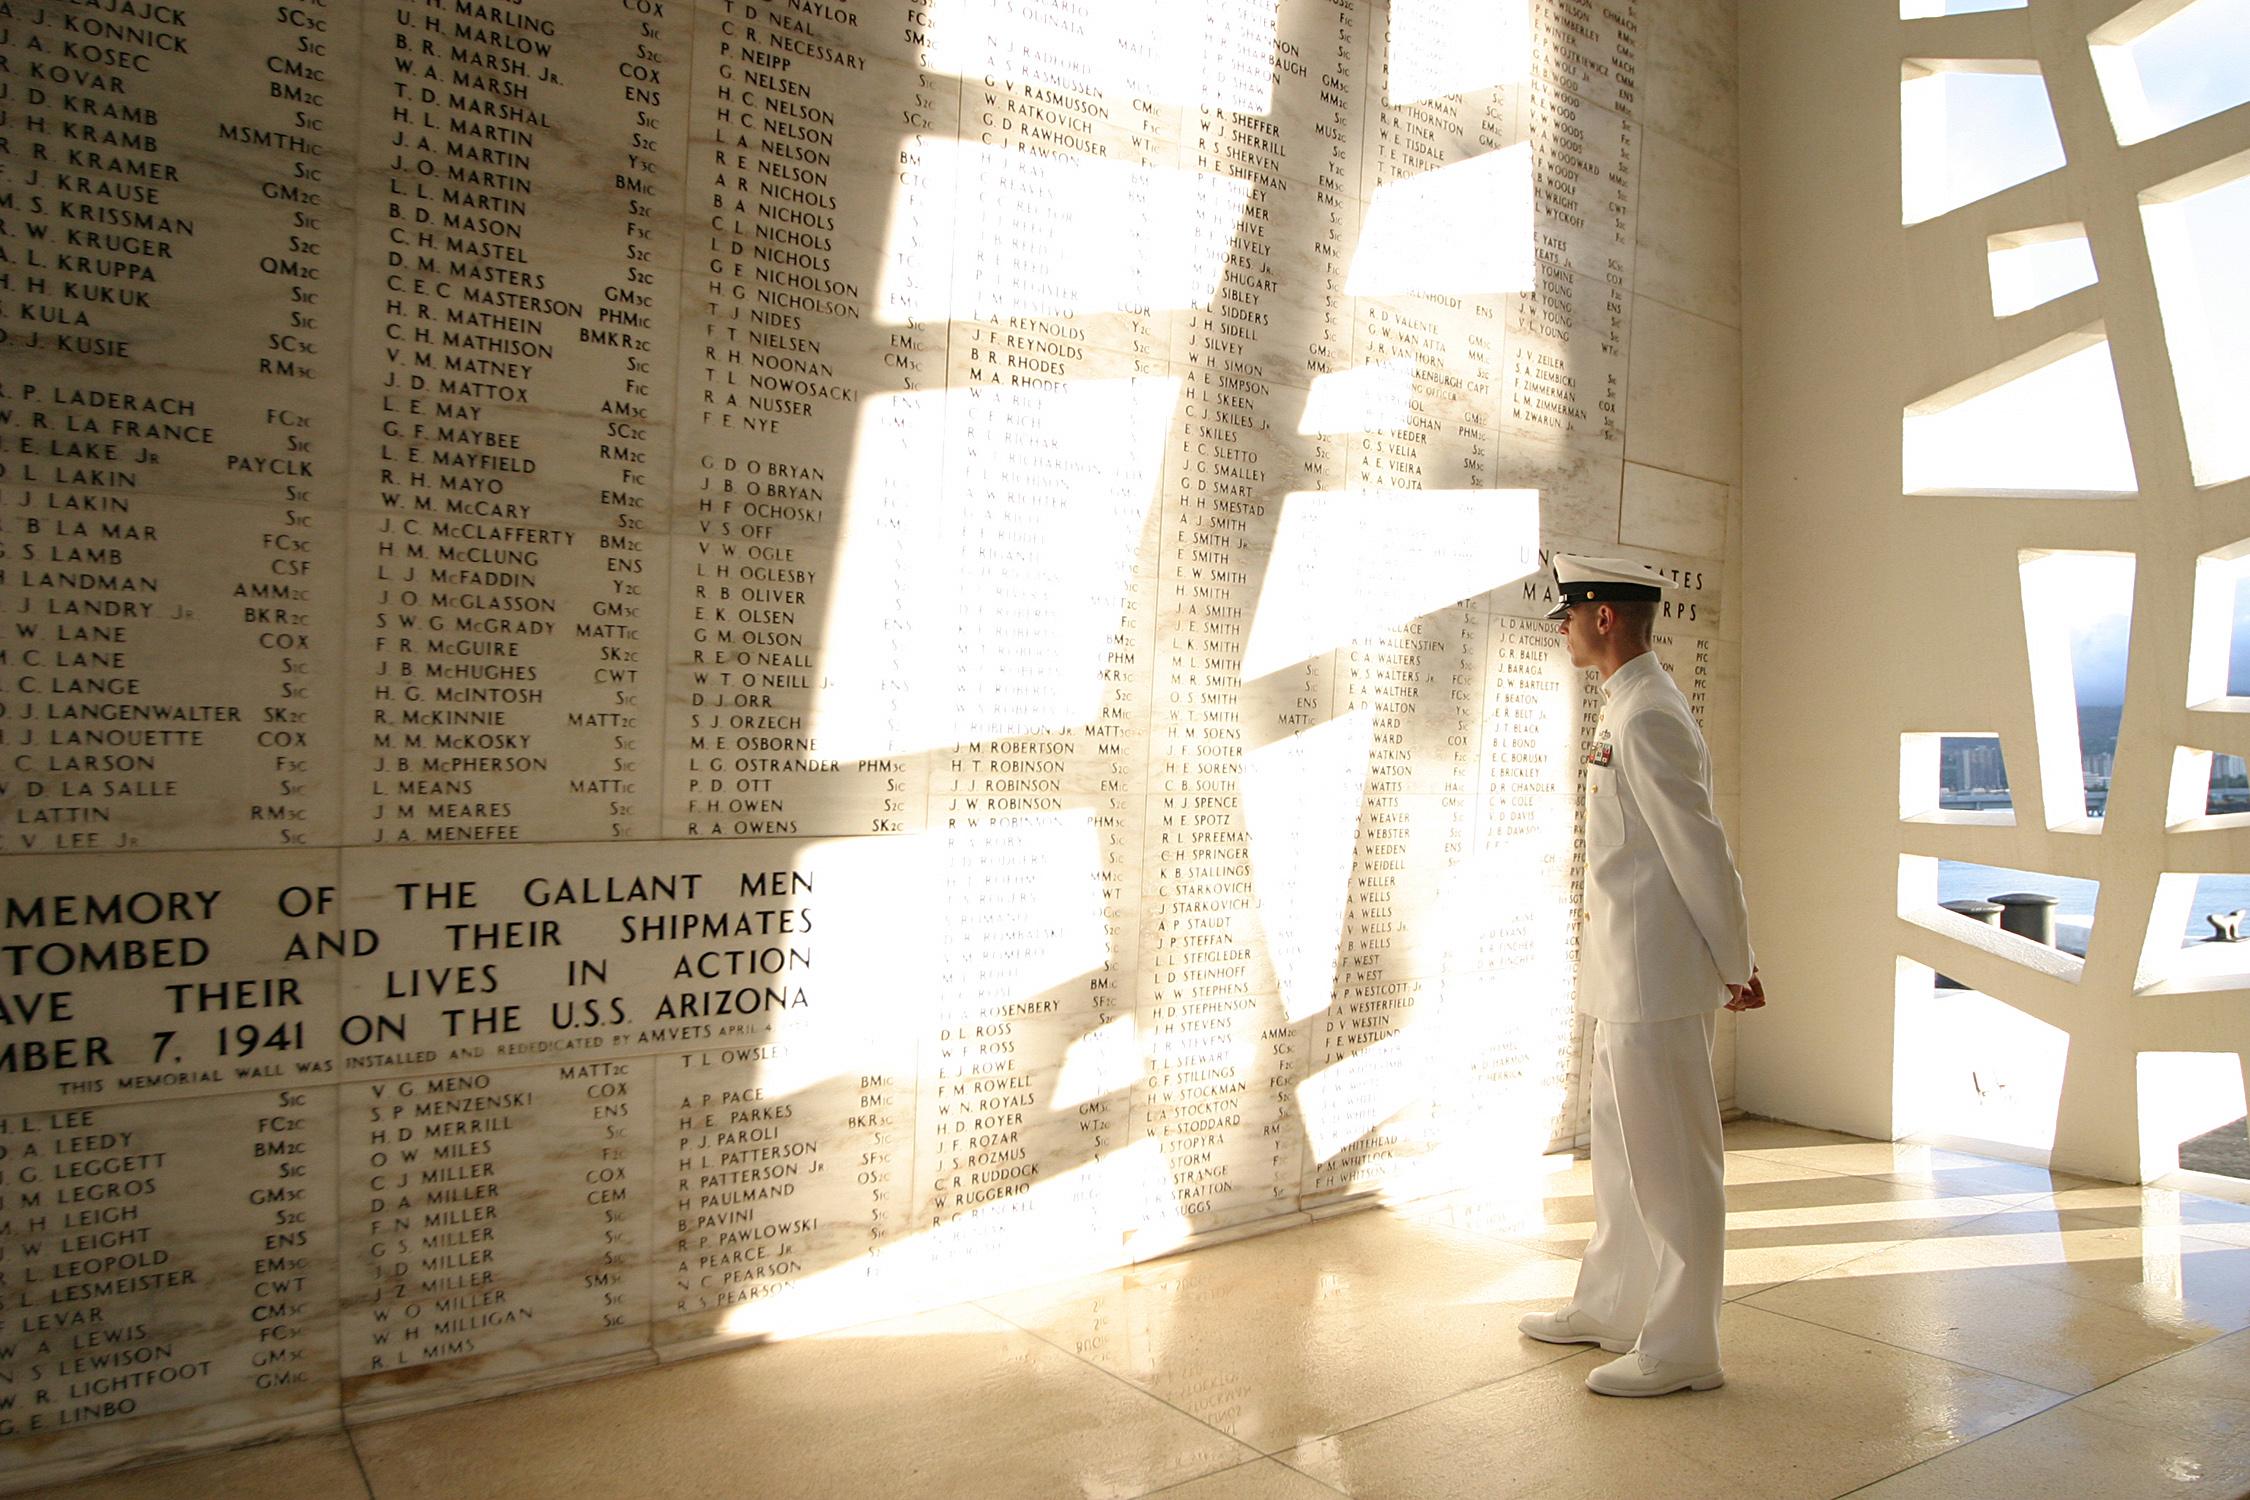 USS Arizona Memorial Shrine Room